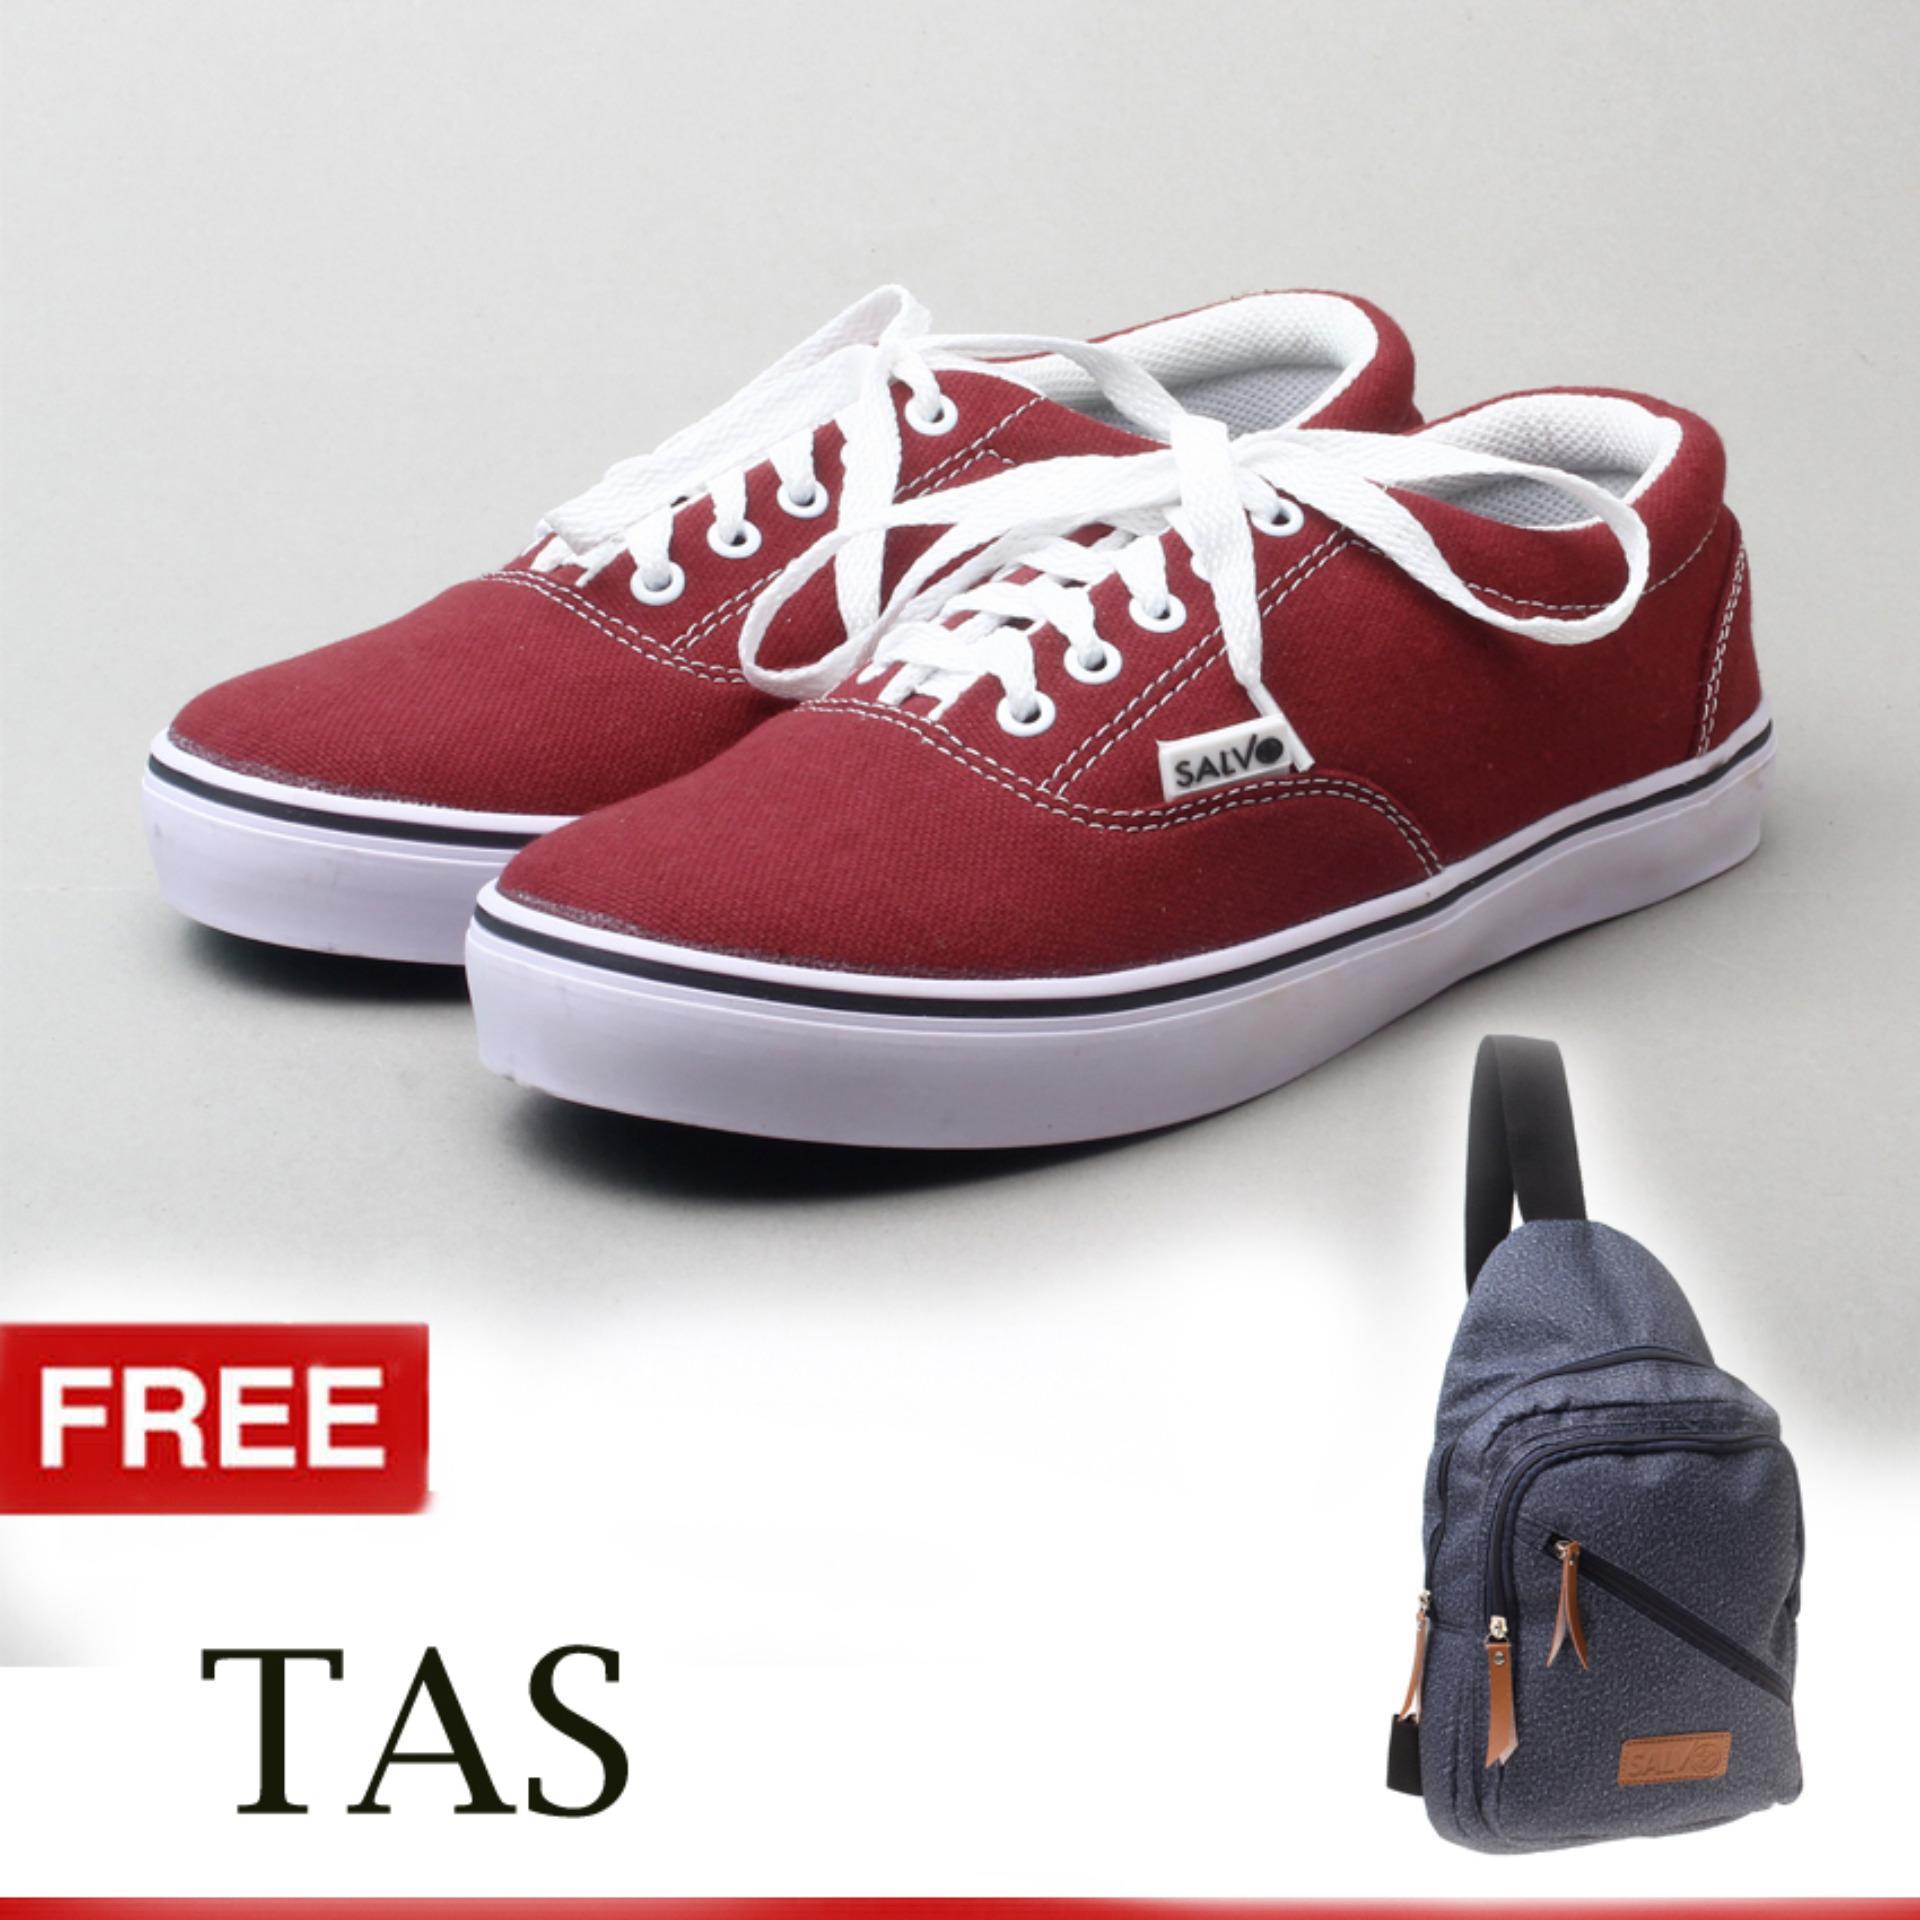 Yutaka Sepatu Kets Sneakers Abu-abu - Biru. Salvo sepatu kets sneakers dan kasual